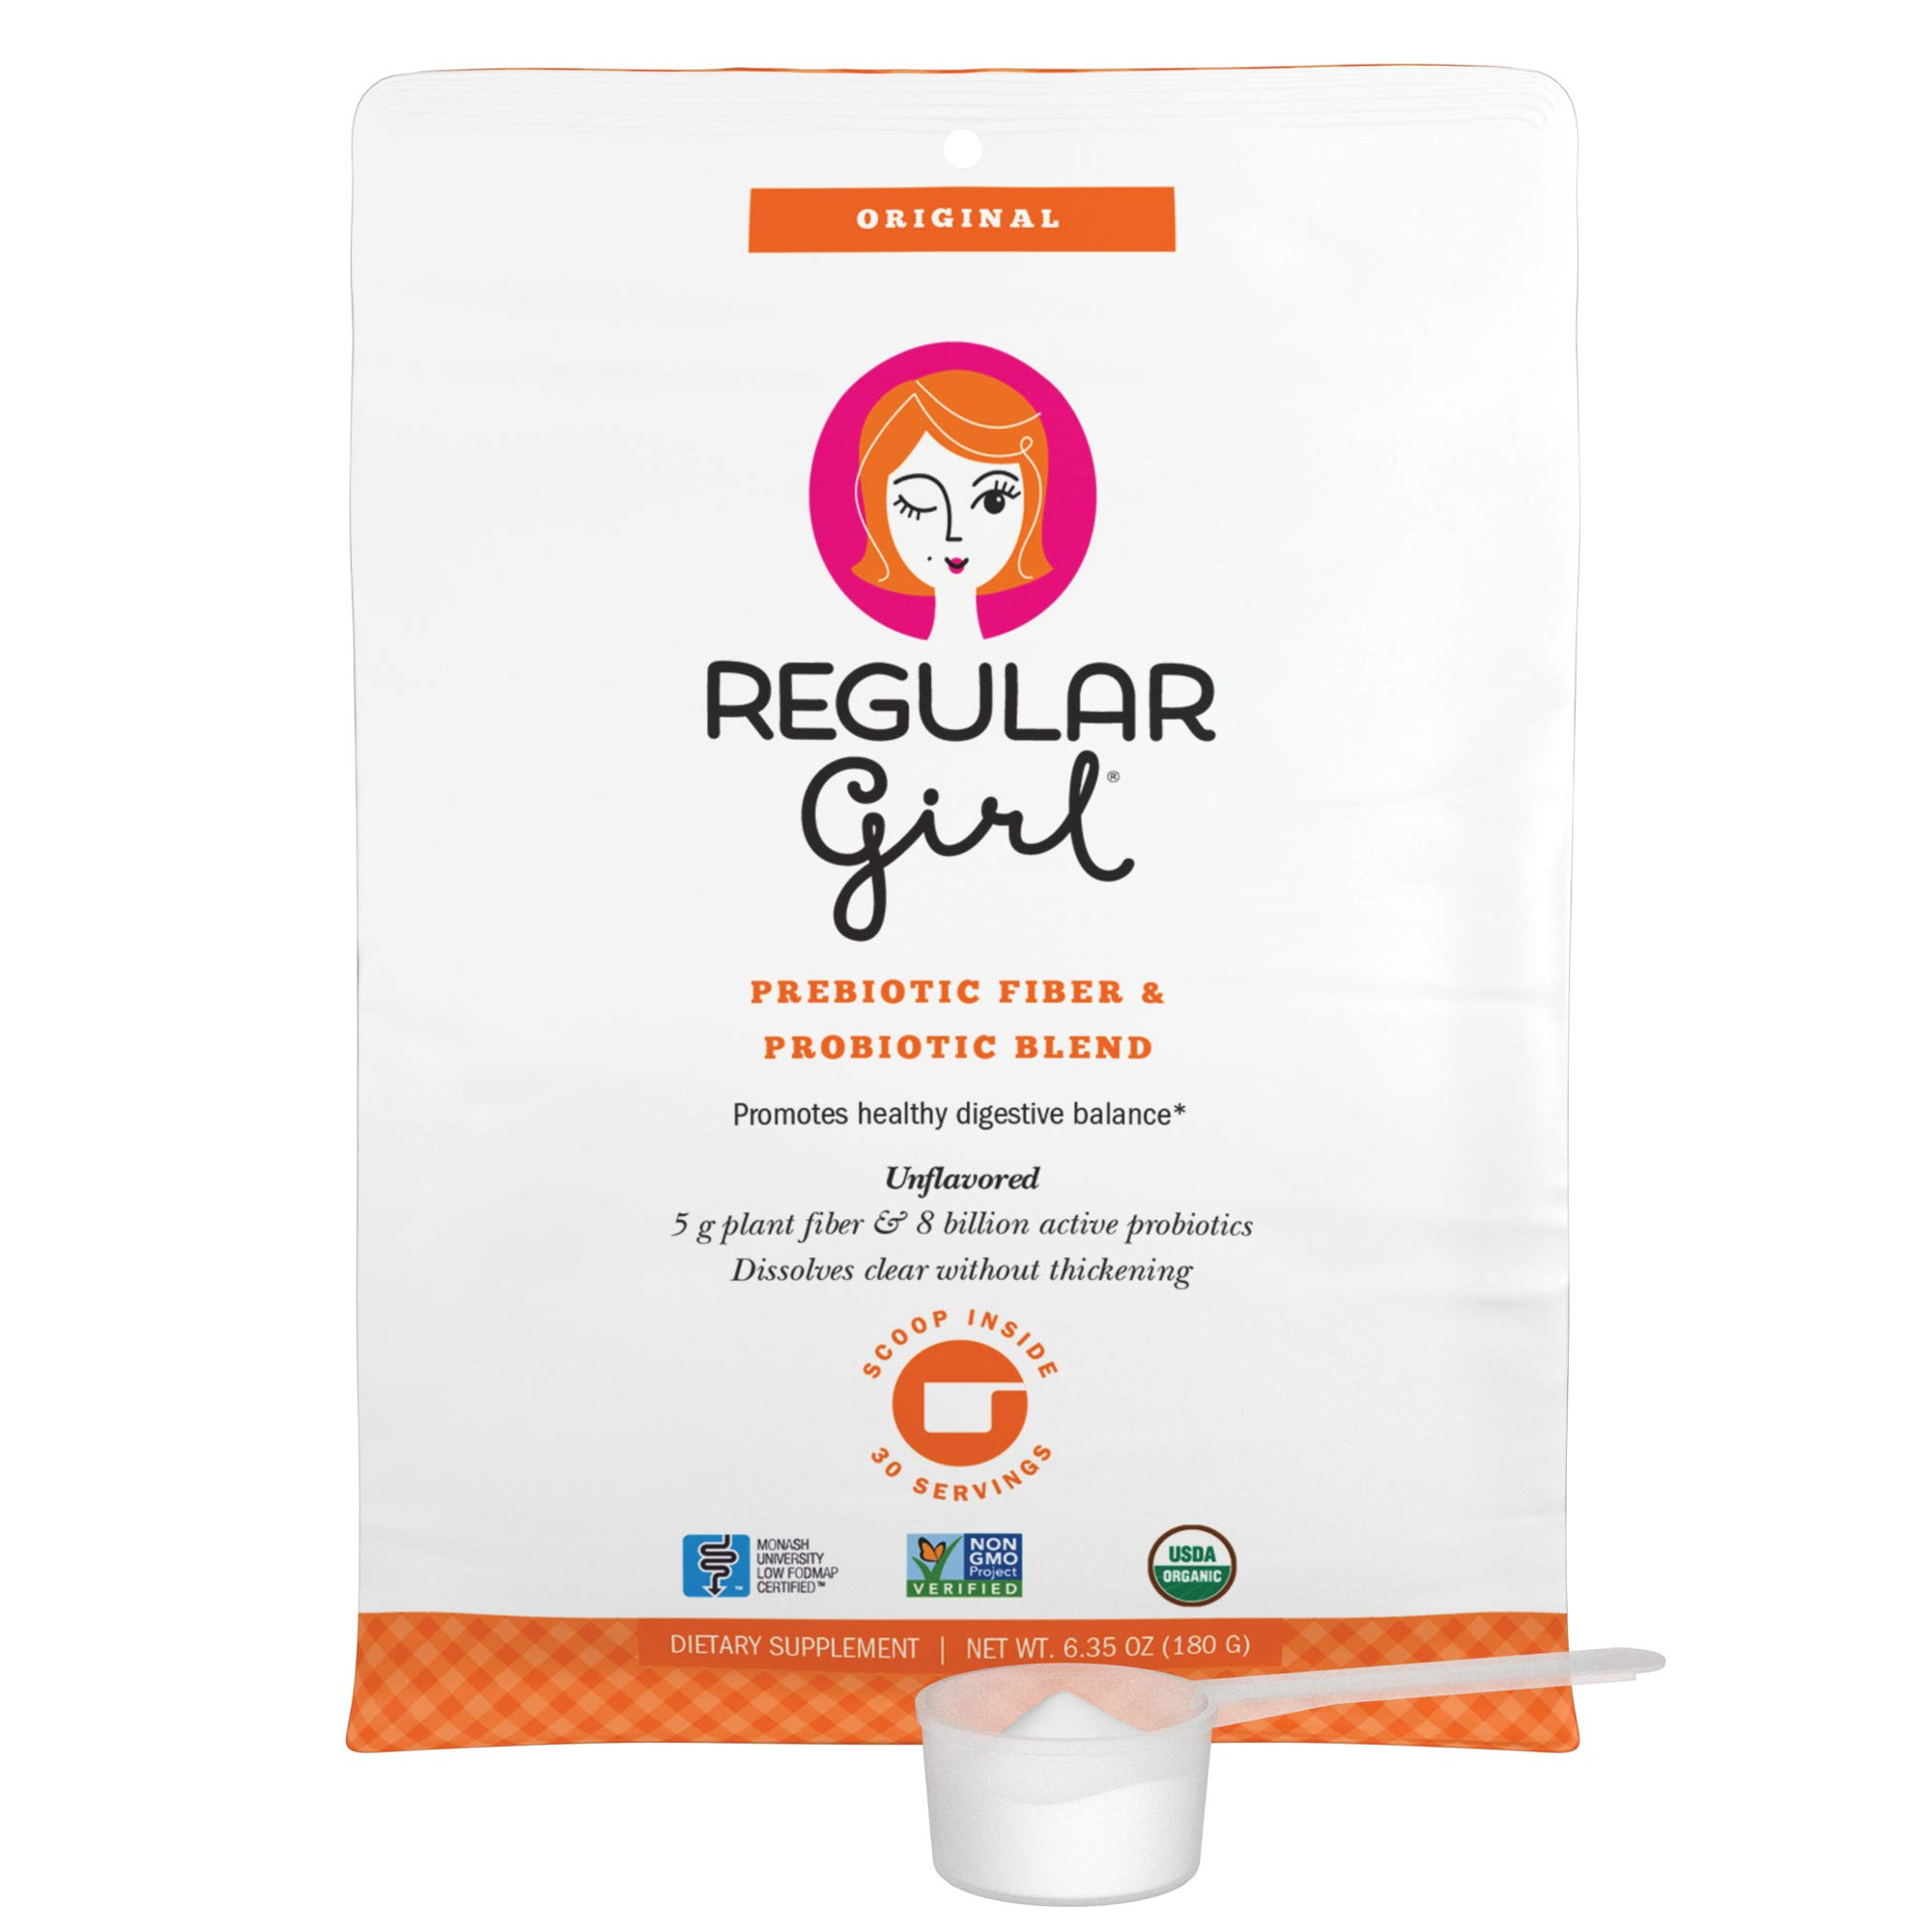 Regular Girl - Organic Powder, Low FODMAP Prebiotic Fiber and Probiotic Support for Comfortable Digestion and Immunity, 30 Servings